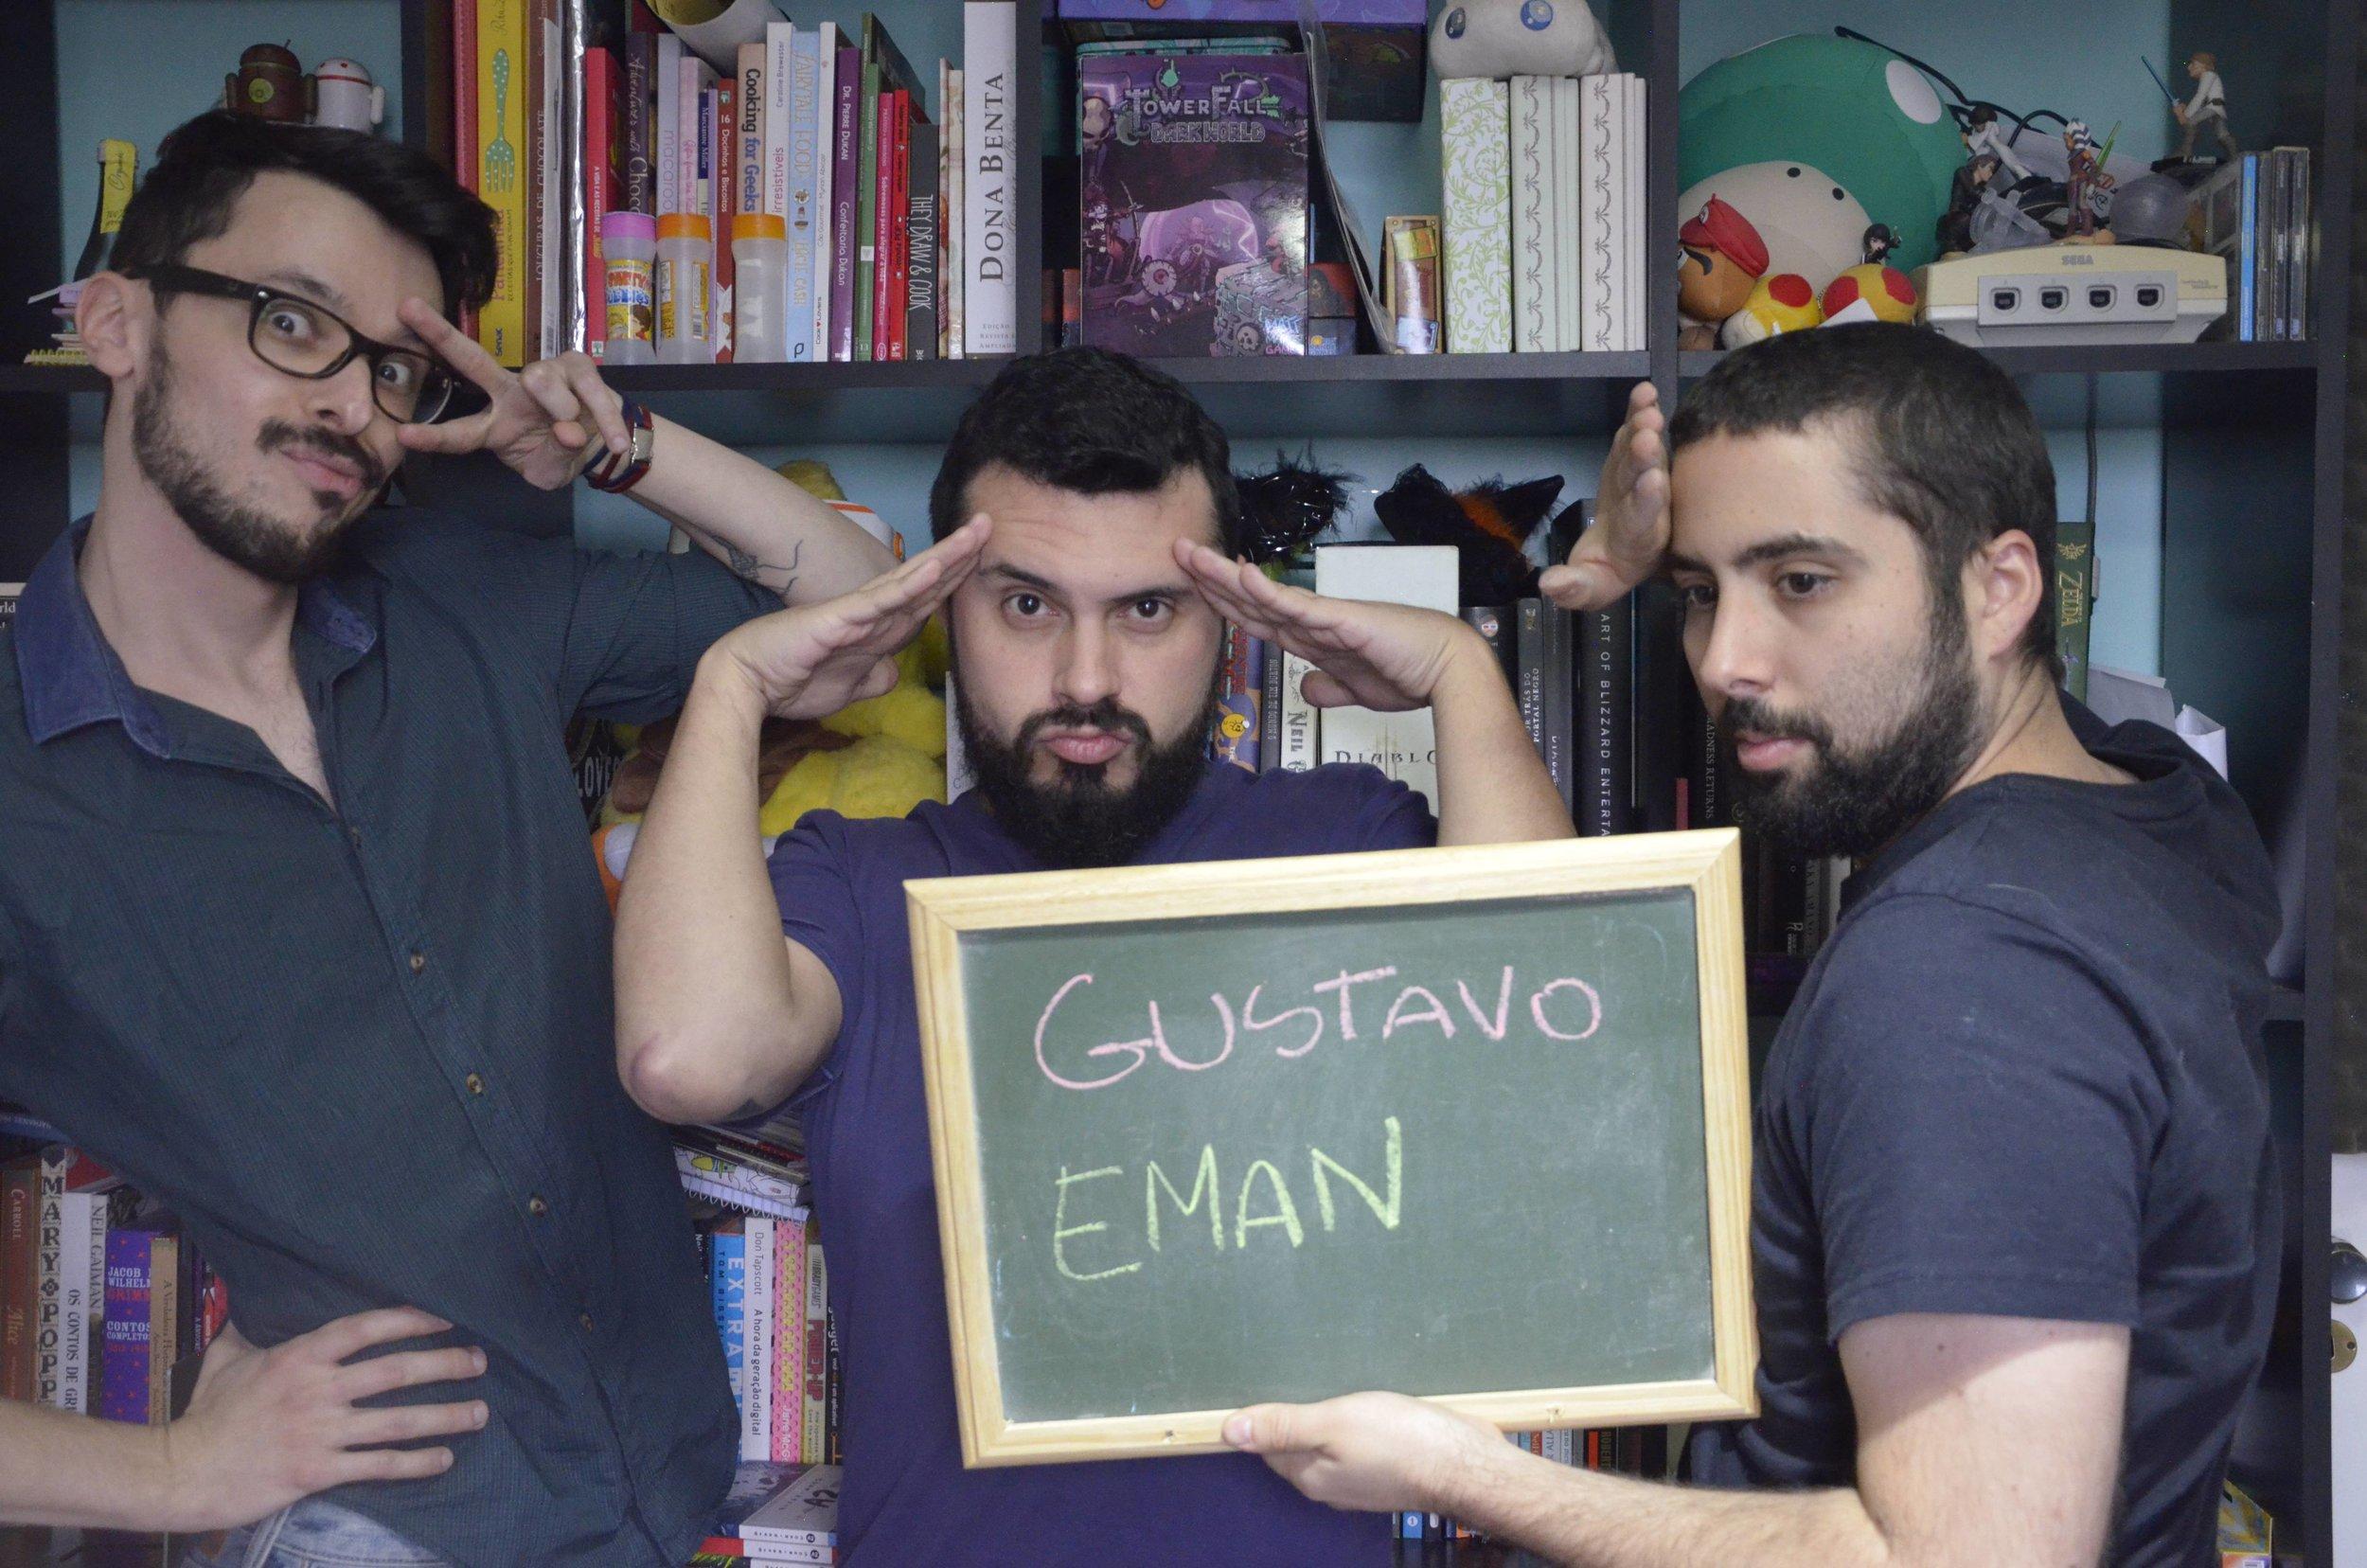 Gustavo-Eman.jpg